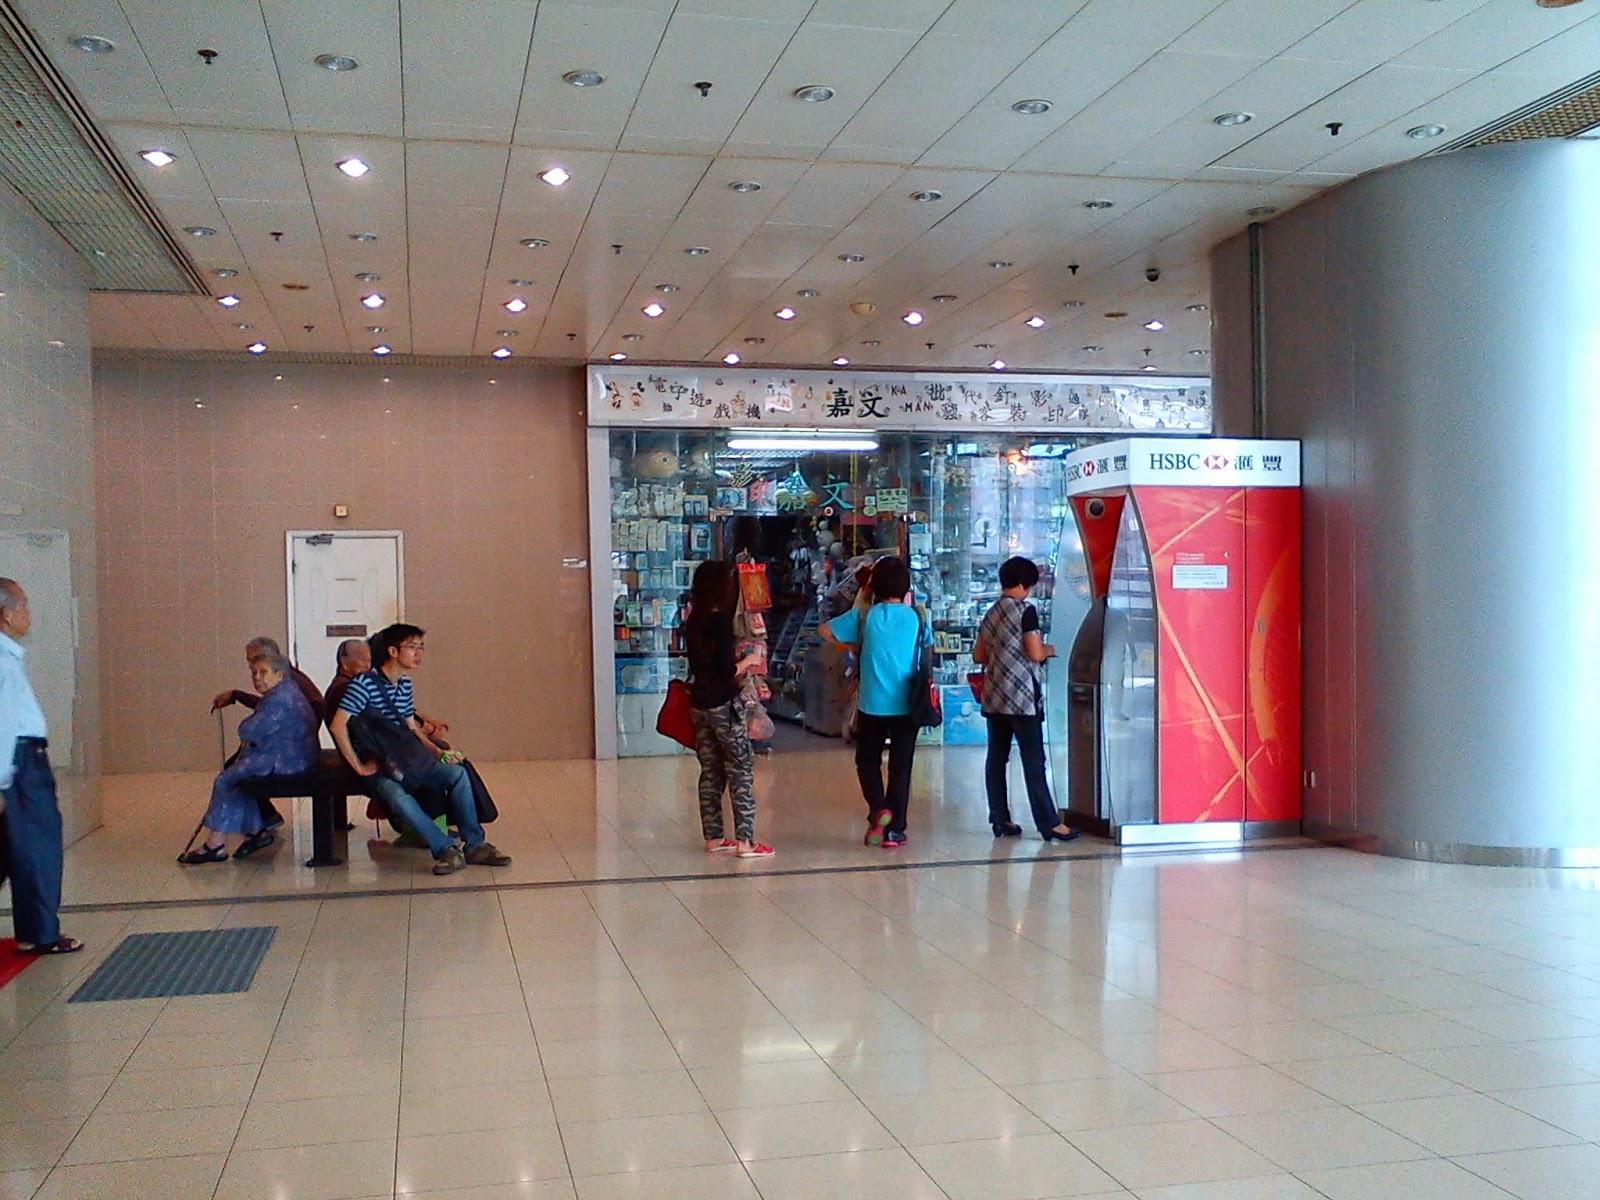 Grassroots O2: 巡視業務.領匯.葵盛東商場 @2012-11-10